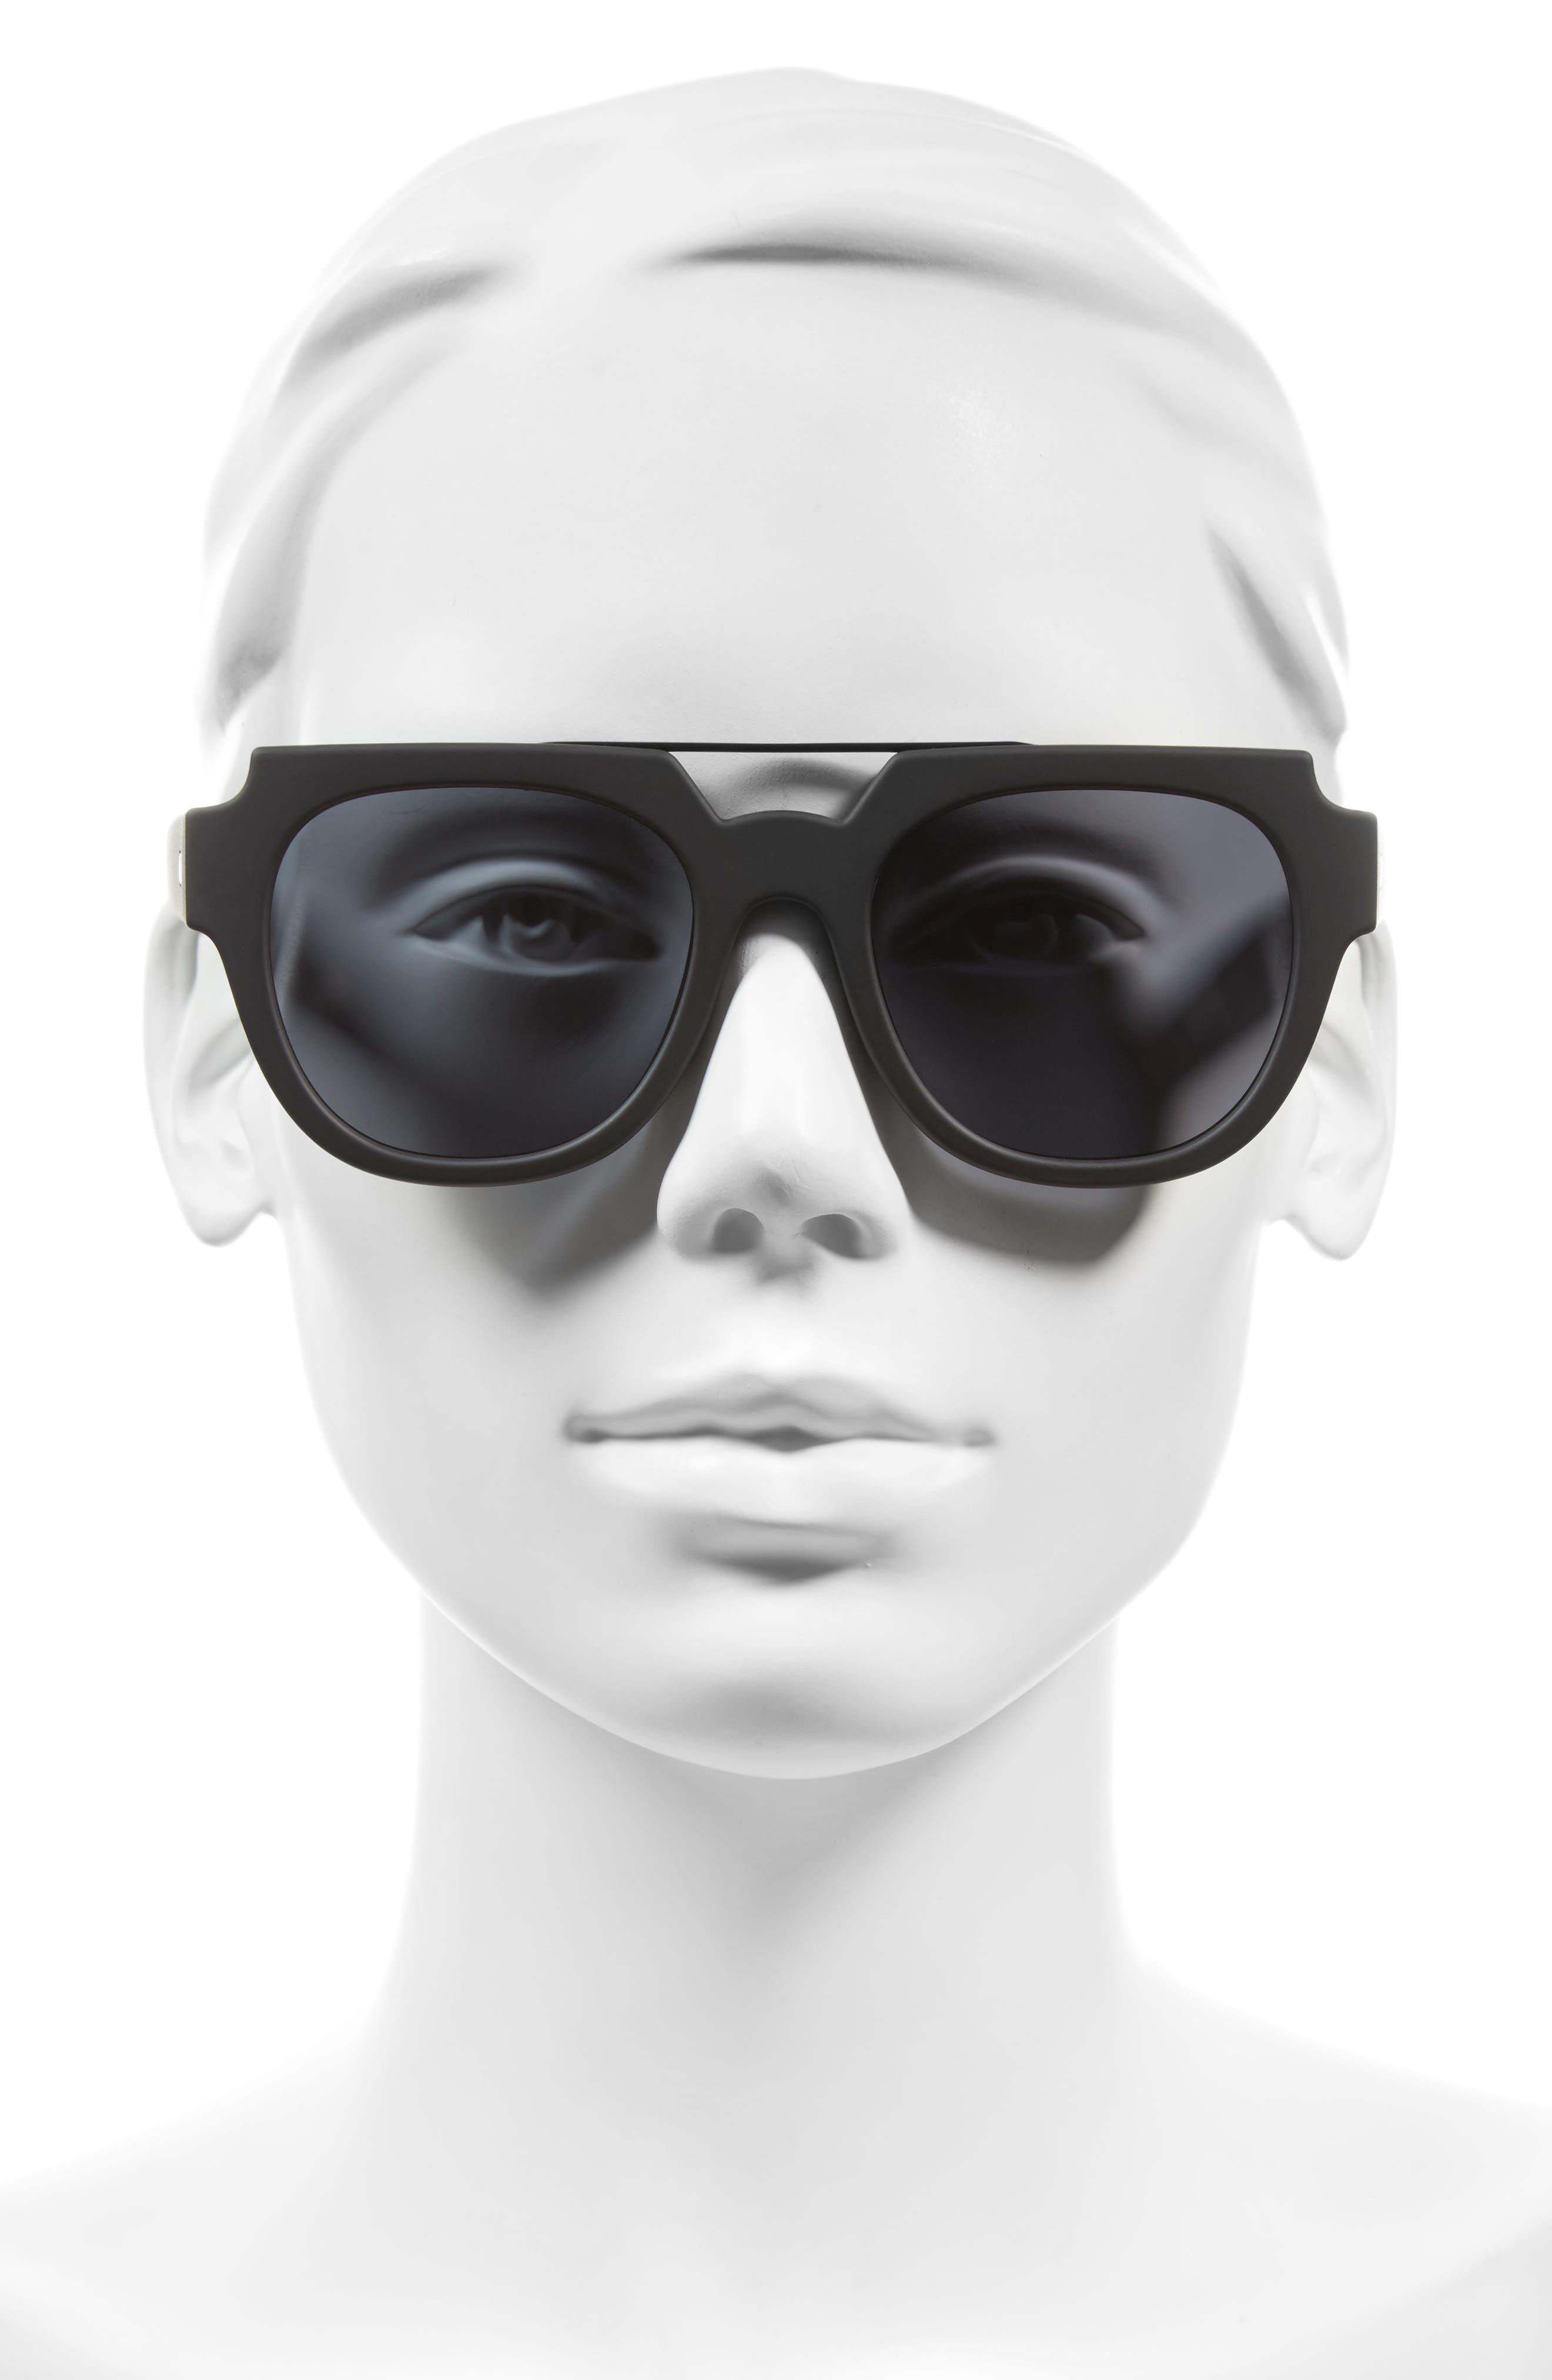 La Habana 52mm Retro Sunglasses,                             Alternate thumbnail 2, color,                             001